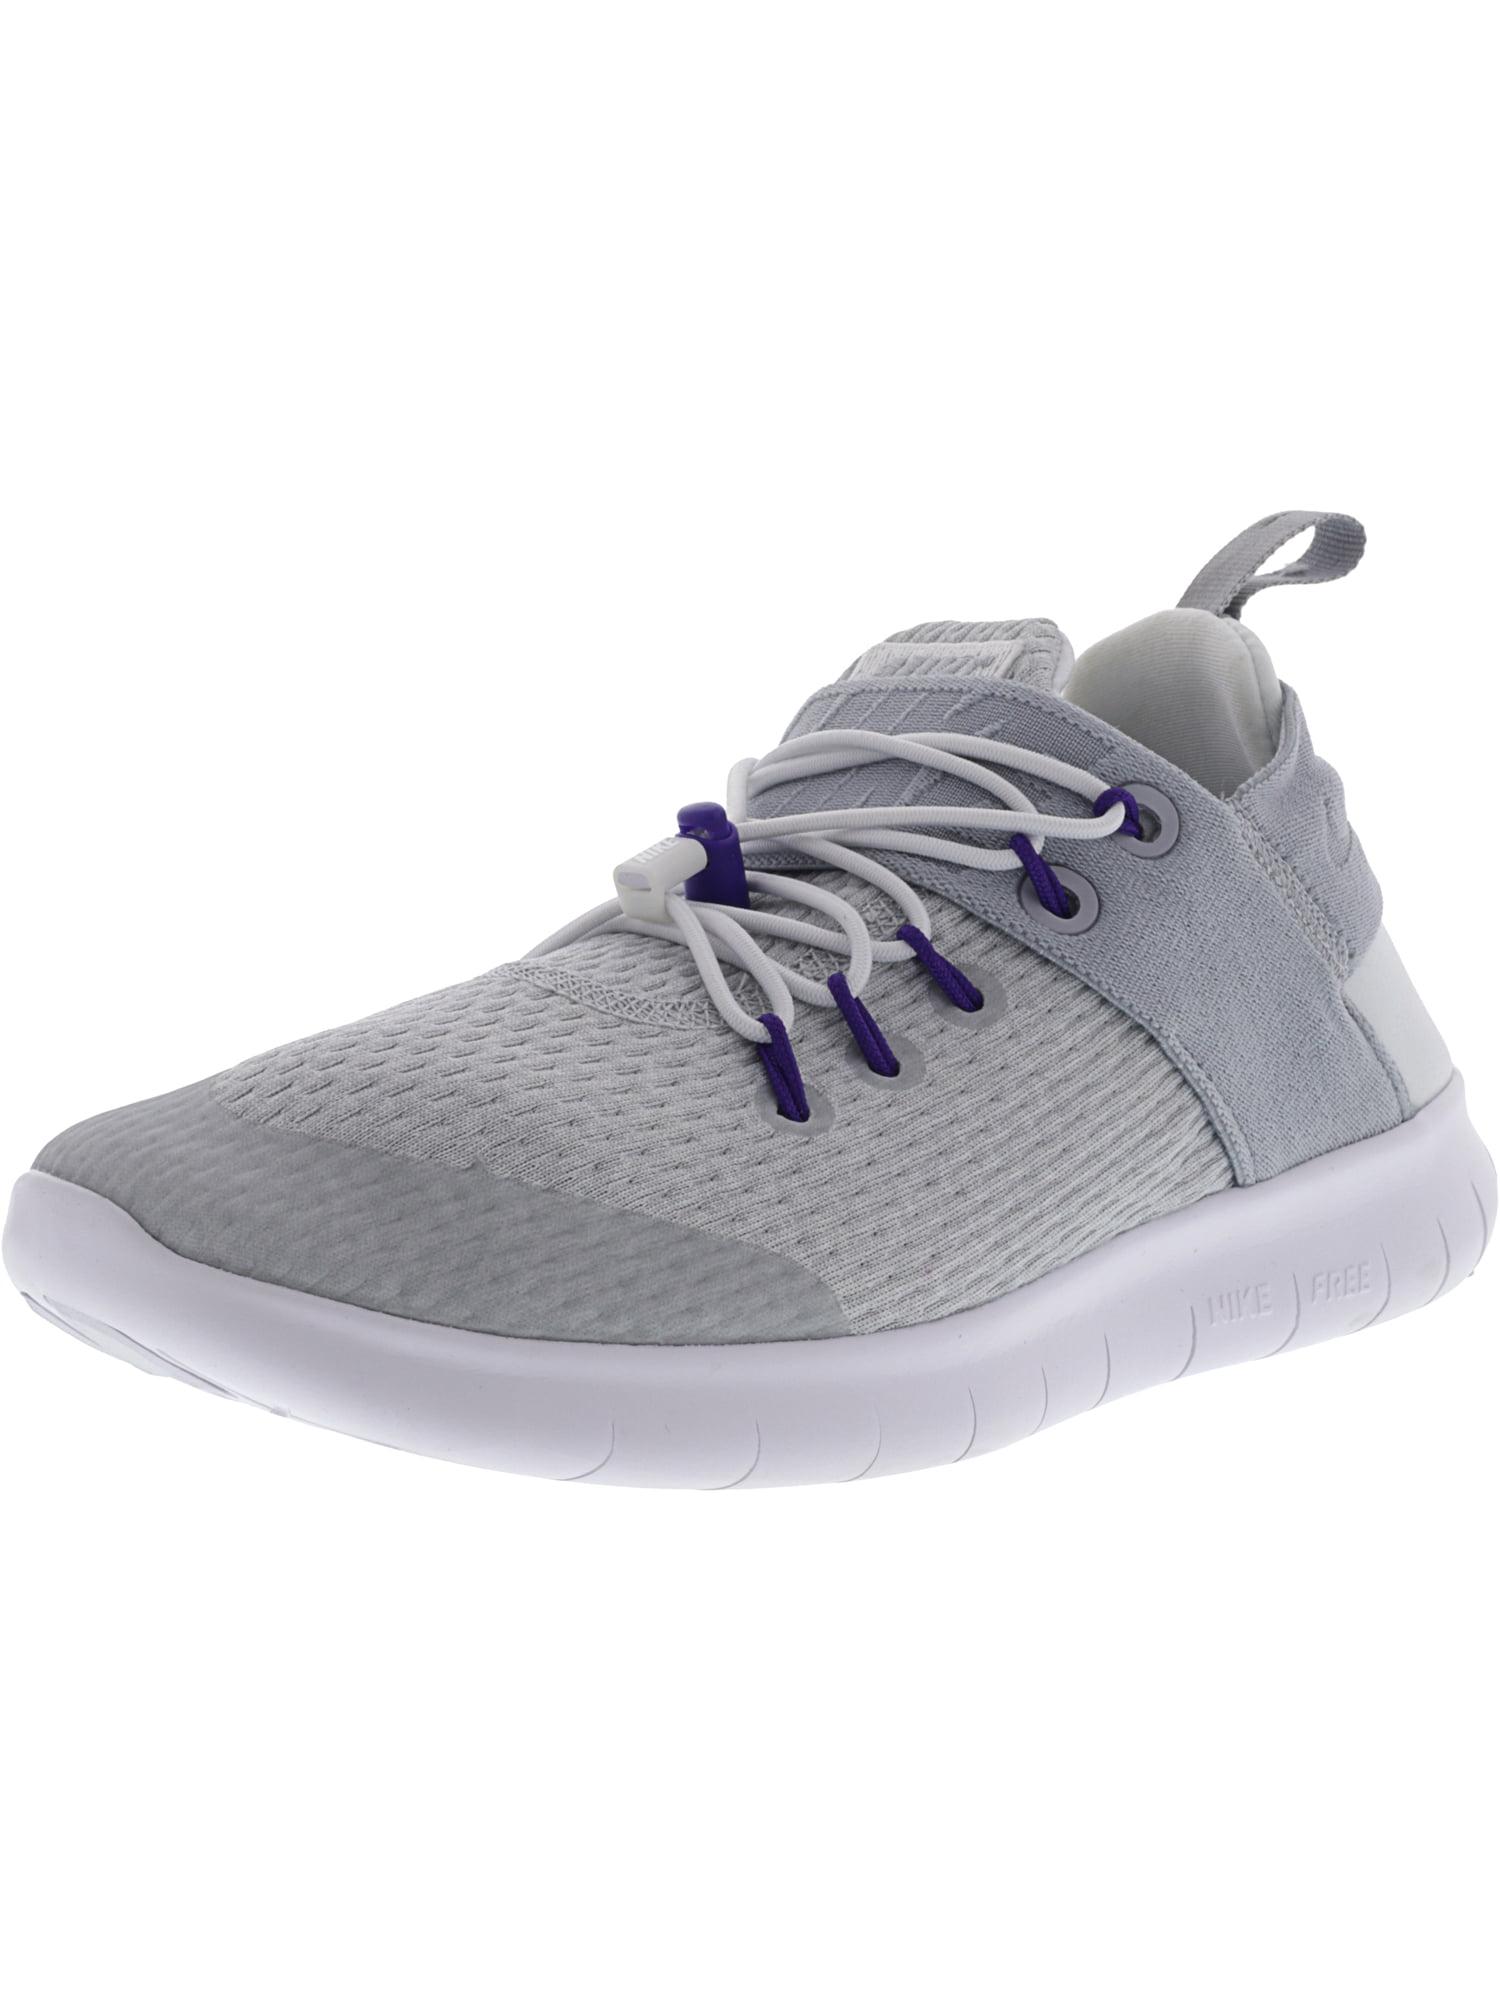 219469ef65cf Nike - Nike Women s Free Rn Cmtr 2017 E White   New Green - Ankle ...